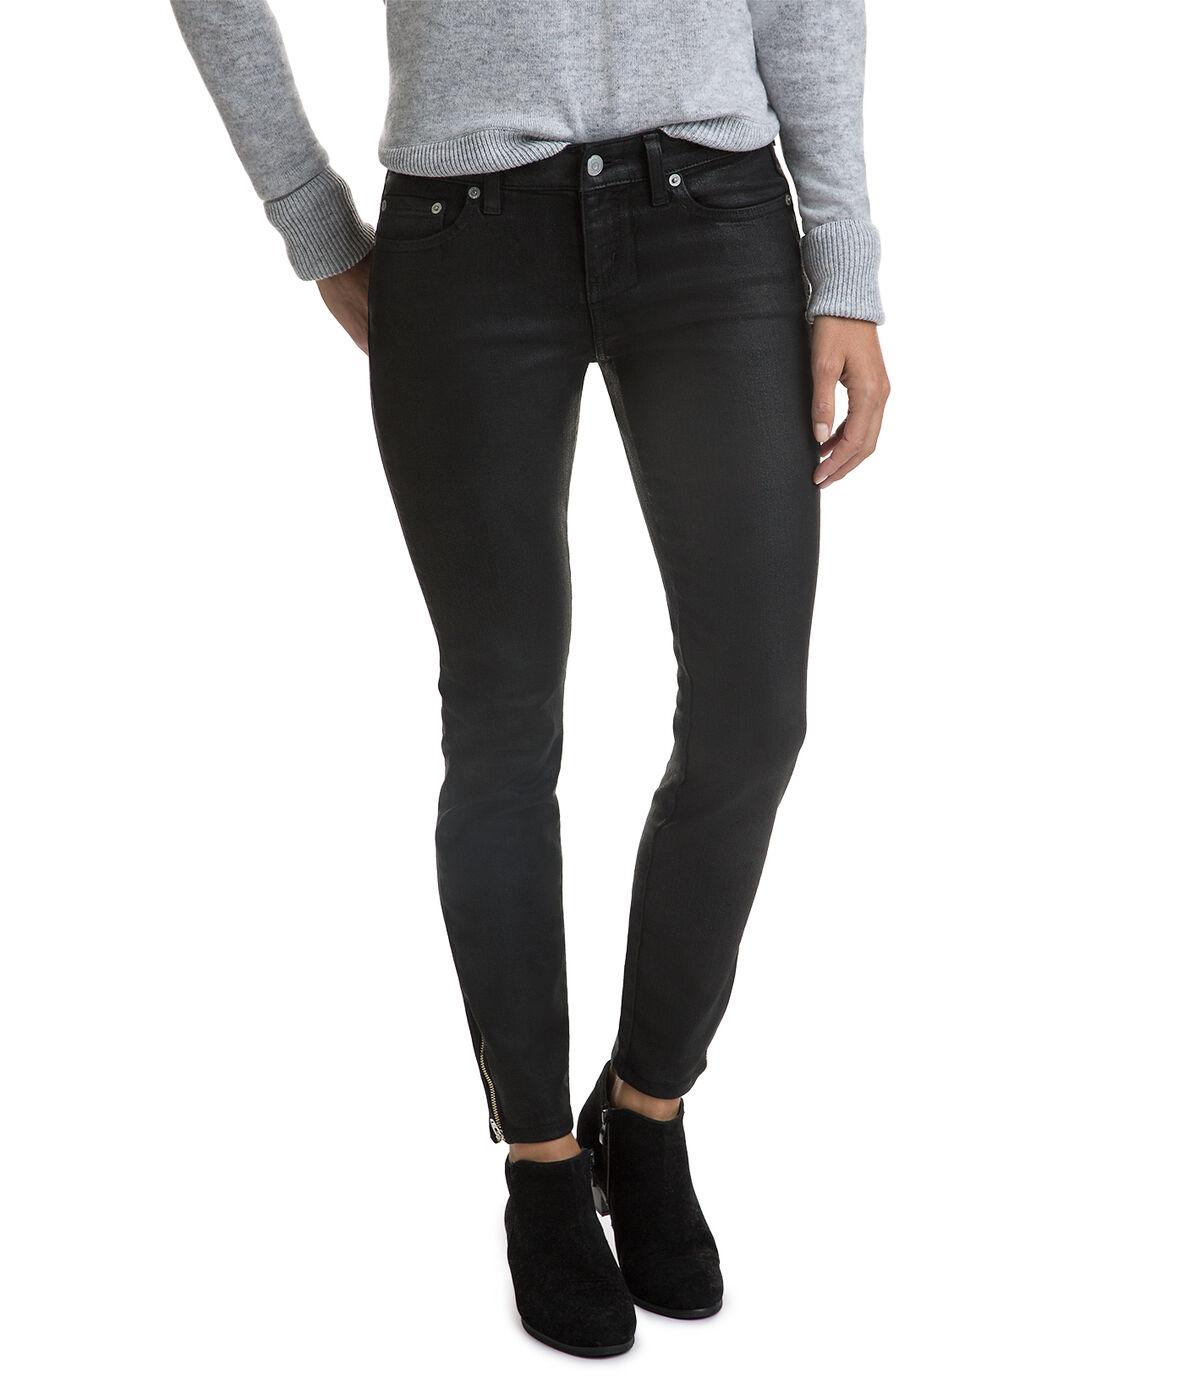 Vineyard Vines Women/'s Black Mid-Rise Black Coated Denim Jeans